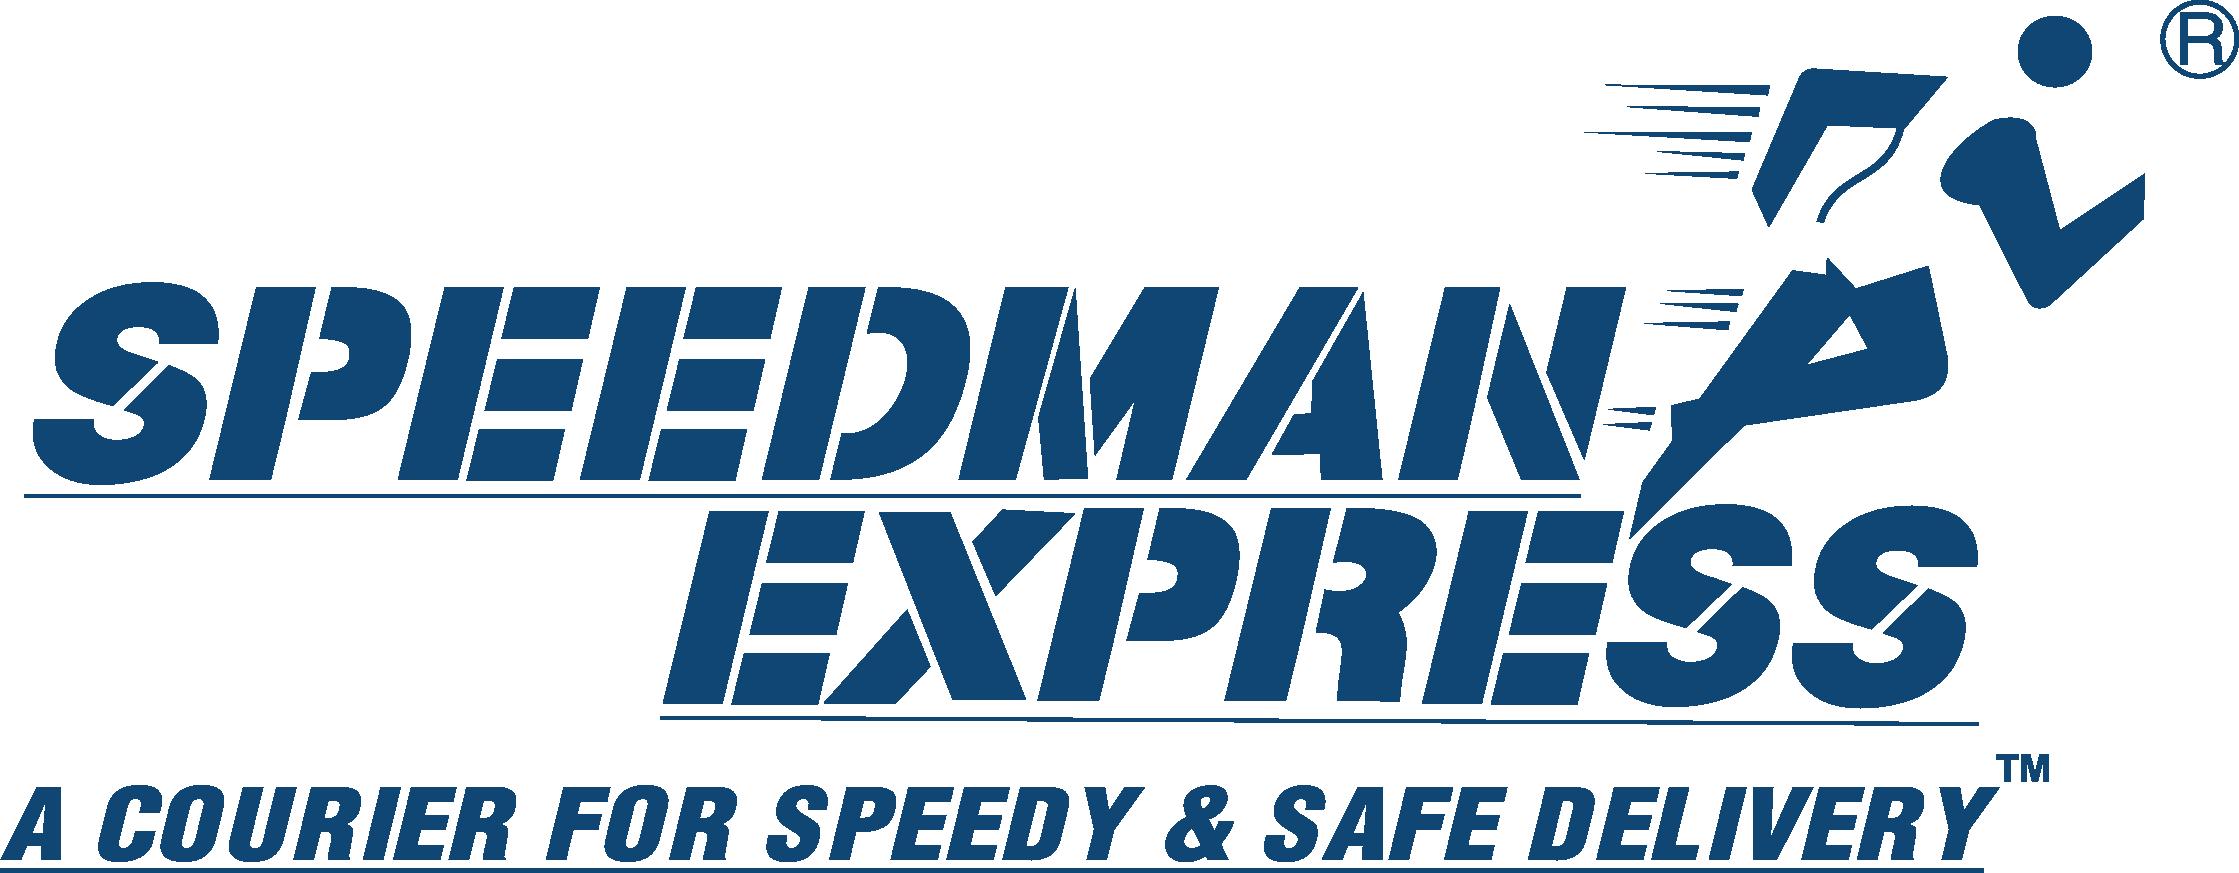 Speedman Express: Tracking